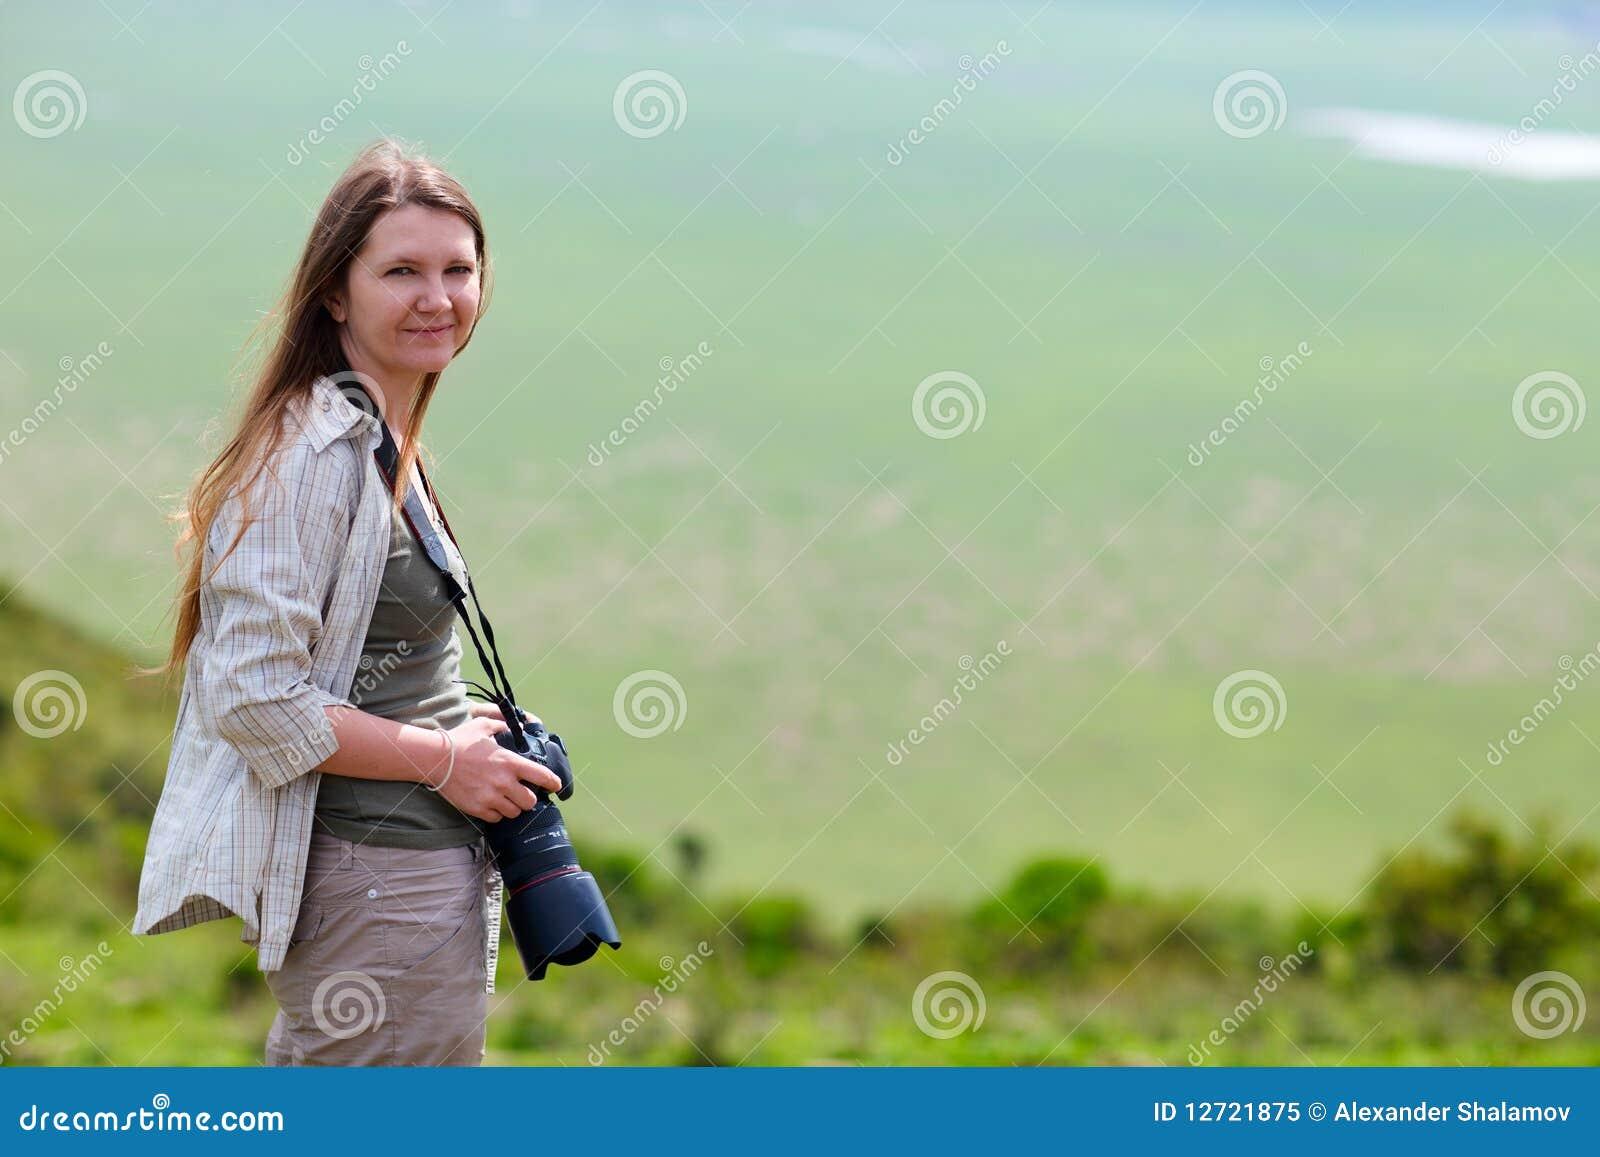 Safari Vacation Stock Image. Image Of Person, Female